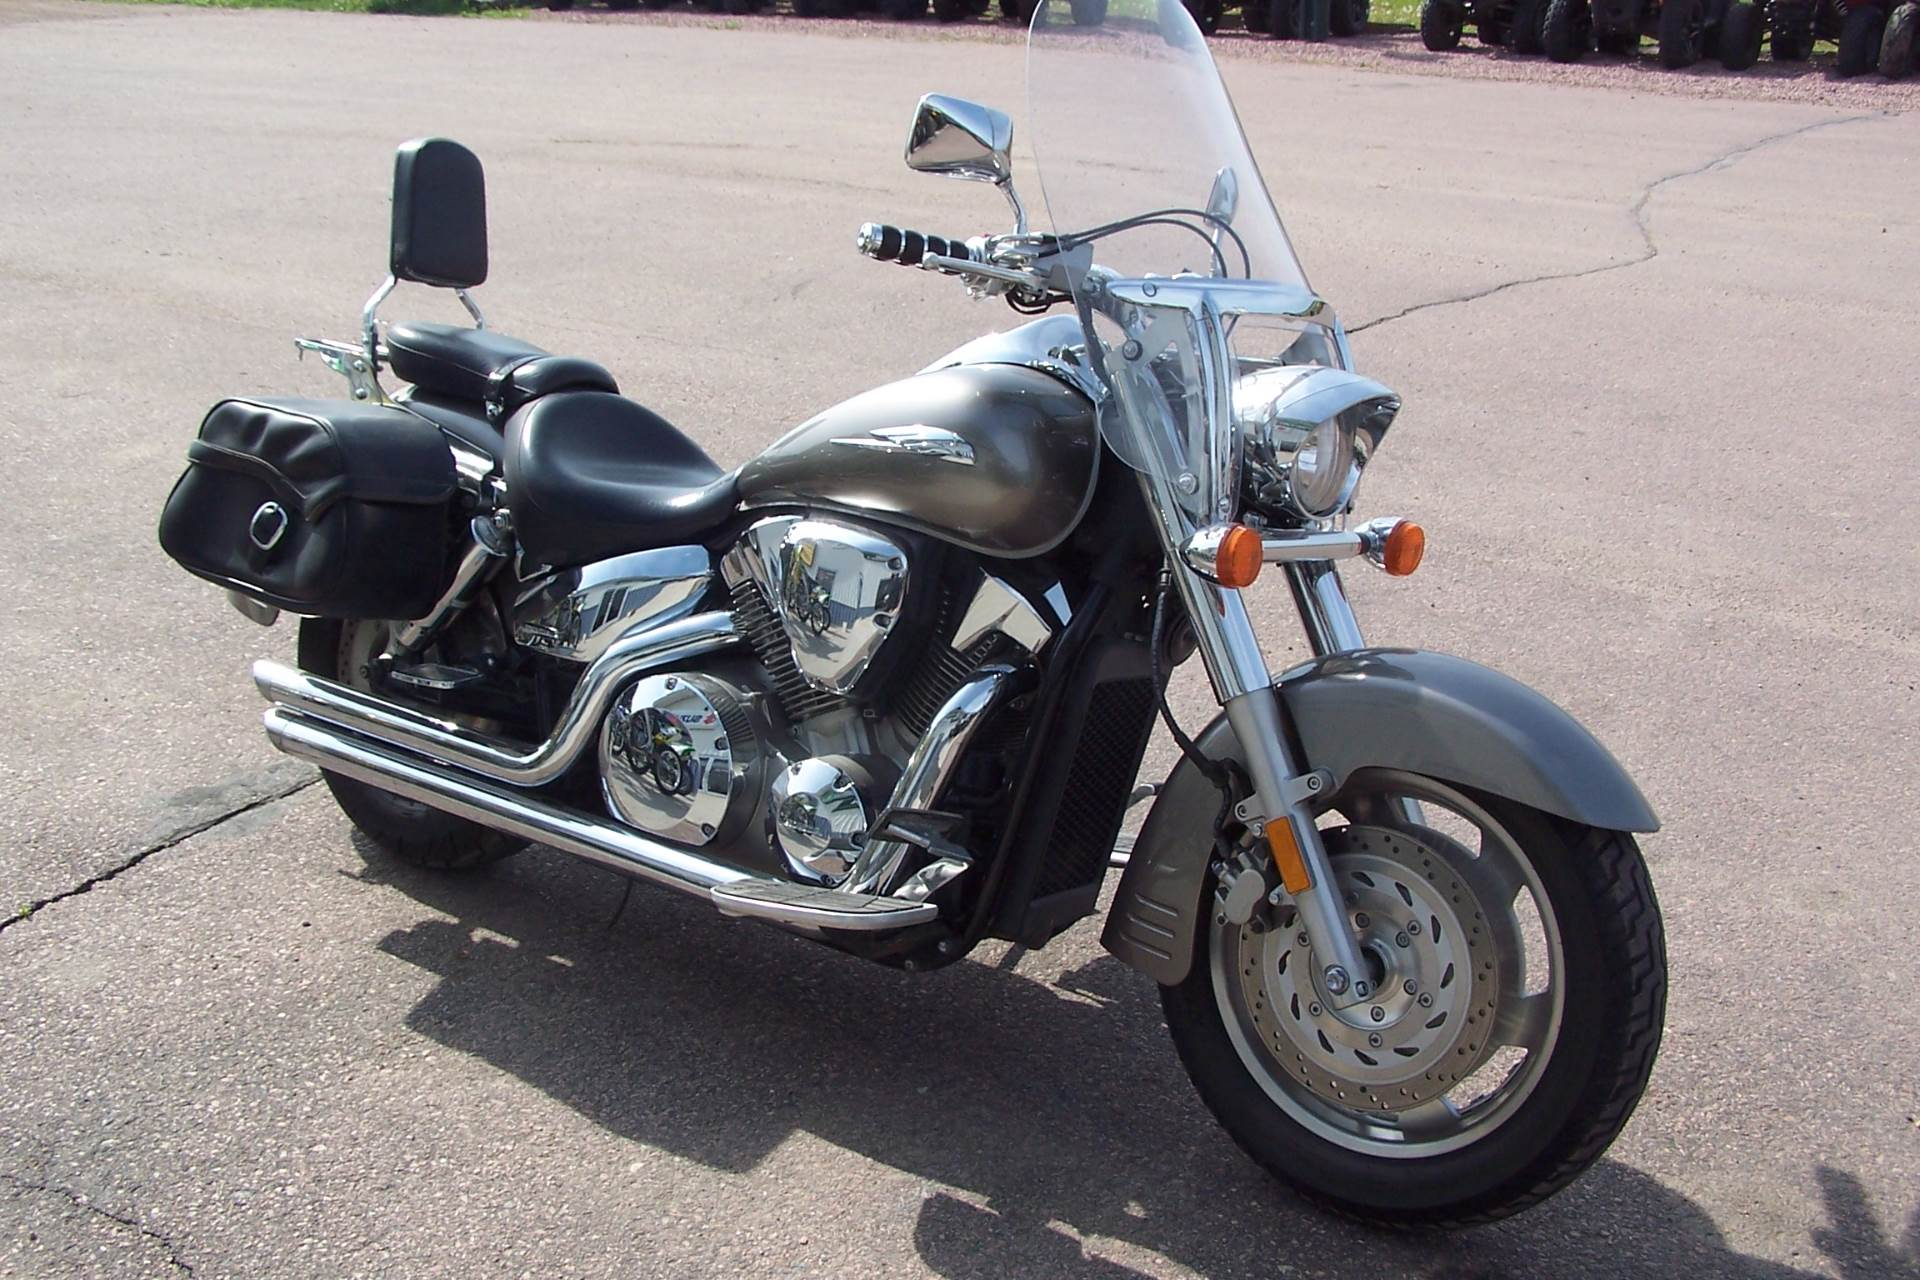 Used 2007 Honda VTX™1300R Motorcycles in Yankton, SD | Stock Number ...